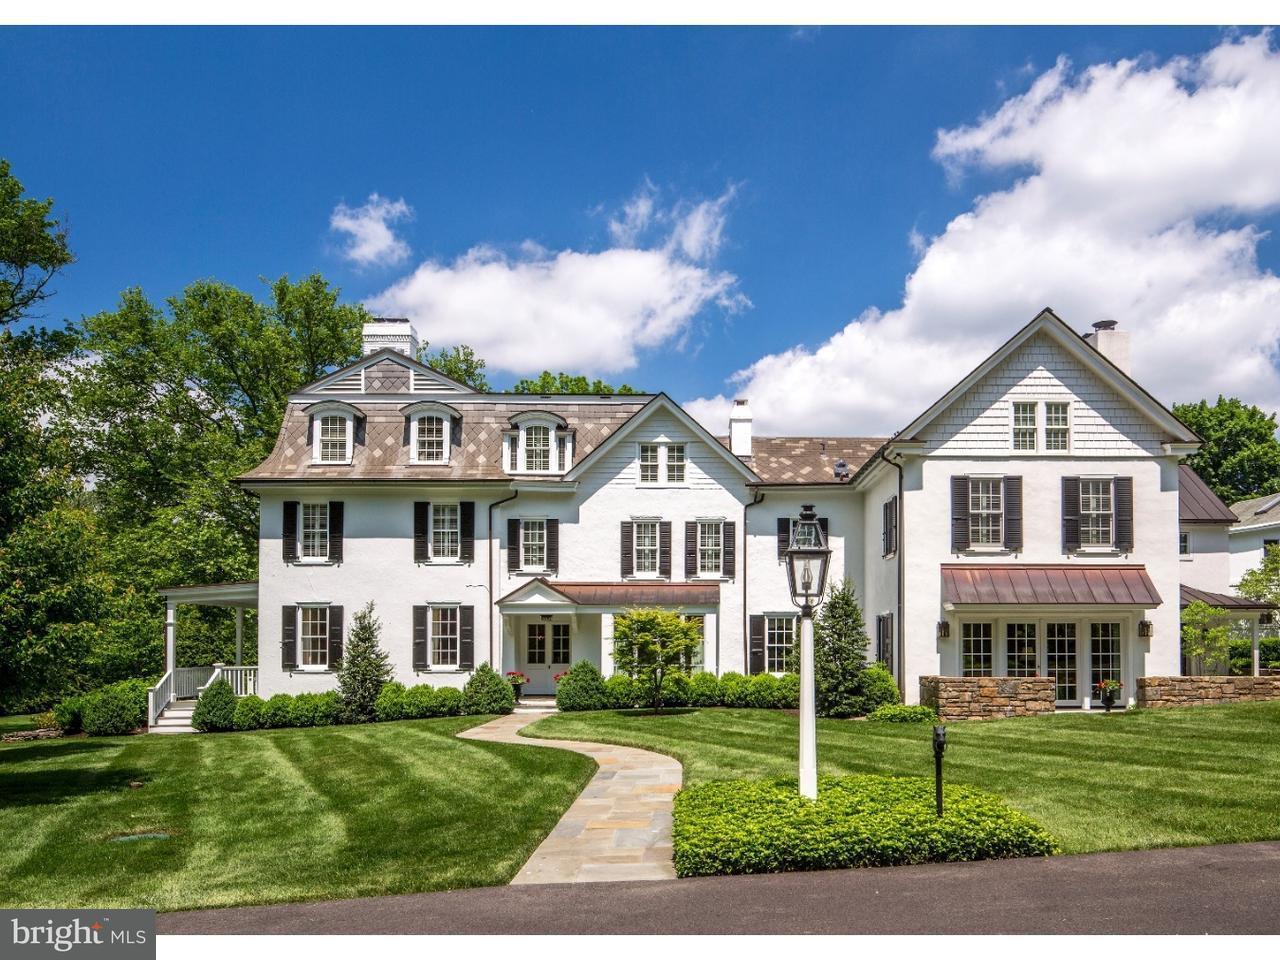 Single Family Home for Sale at 508 PENLLYN PIKE Lower Gwynedd, Pennsylvania 19422 United States